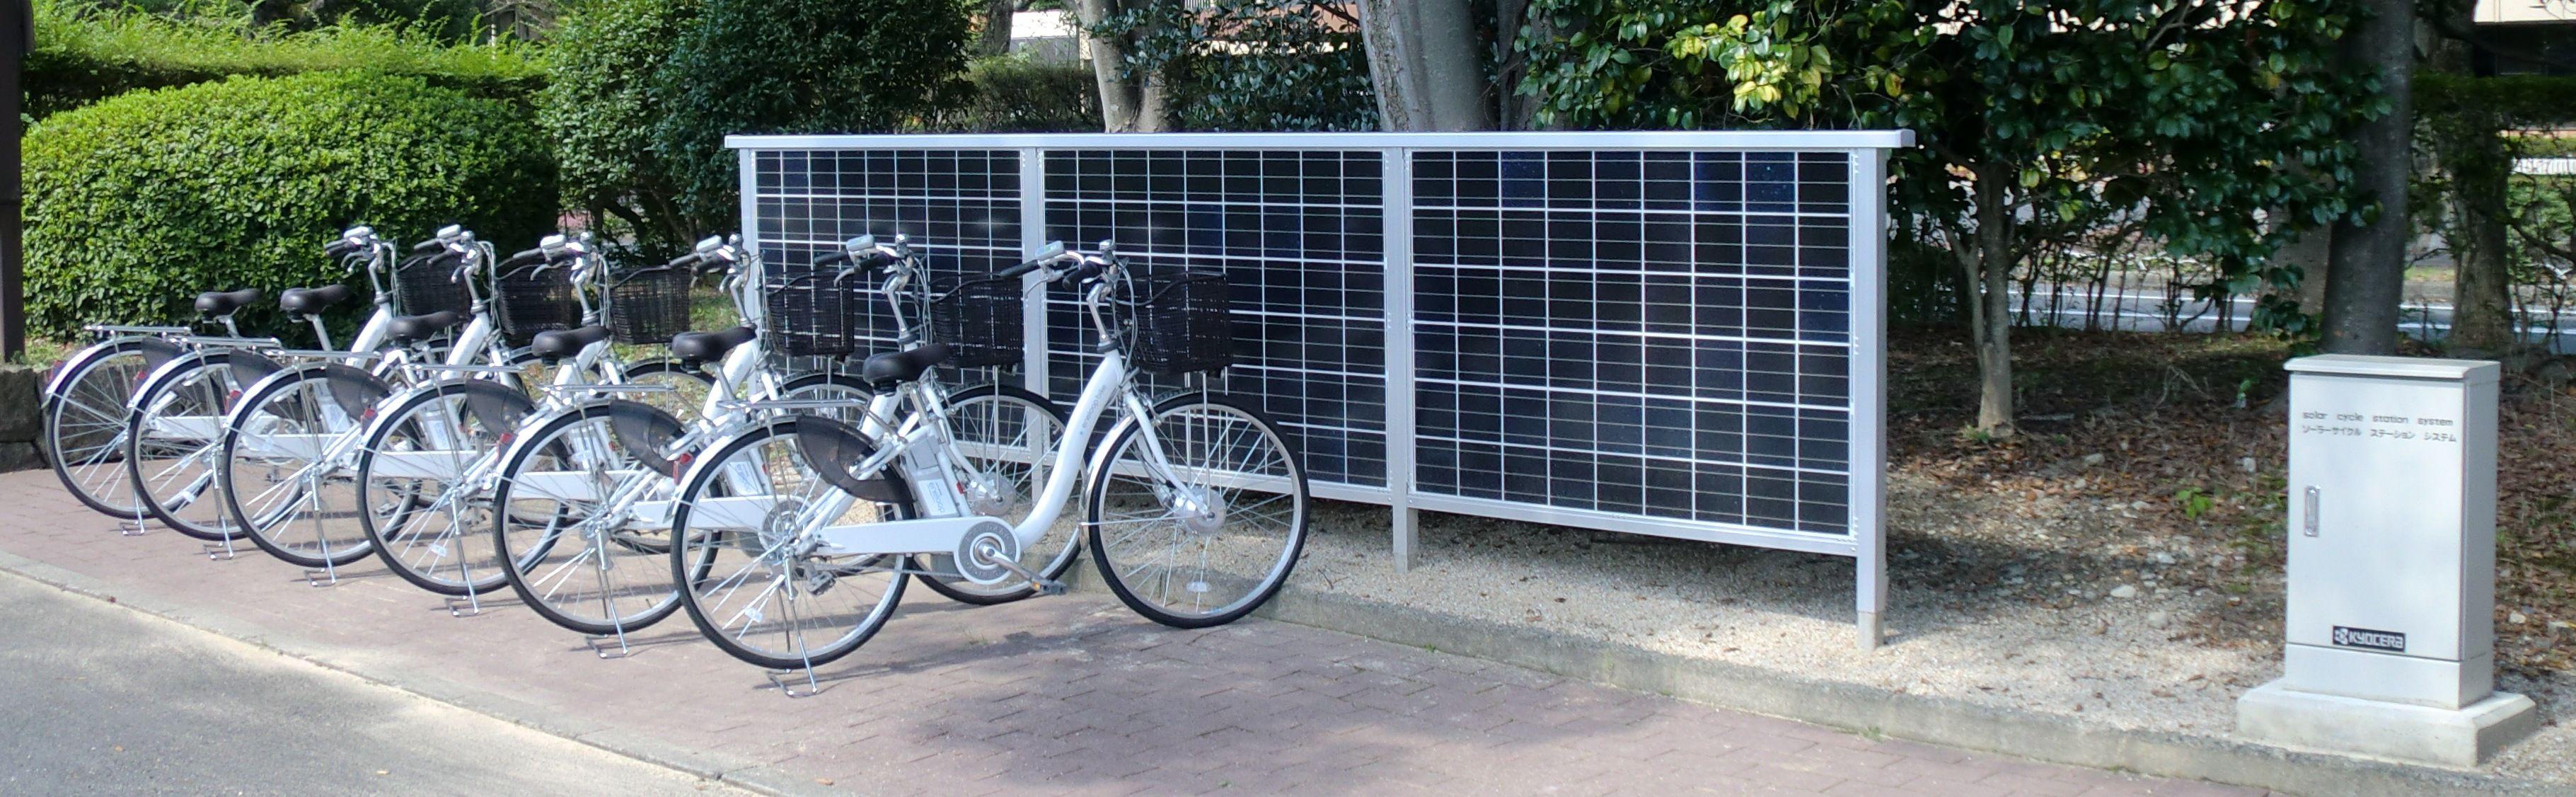 Kyocera_Solar Cycle Station